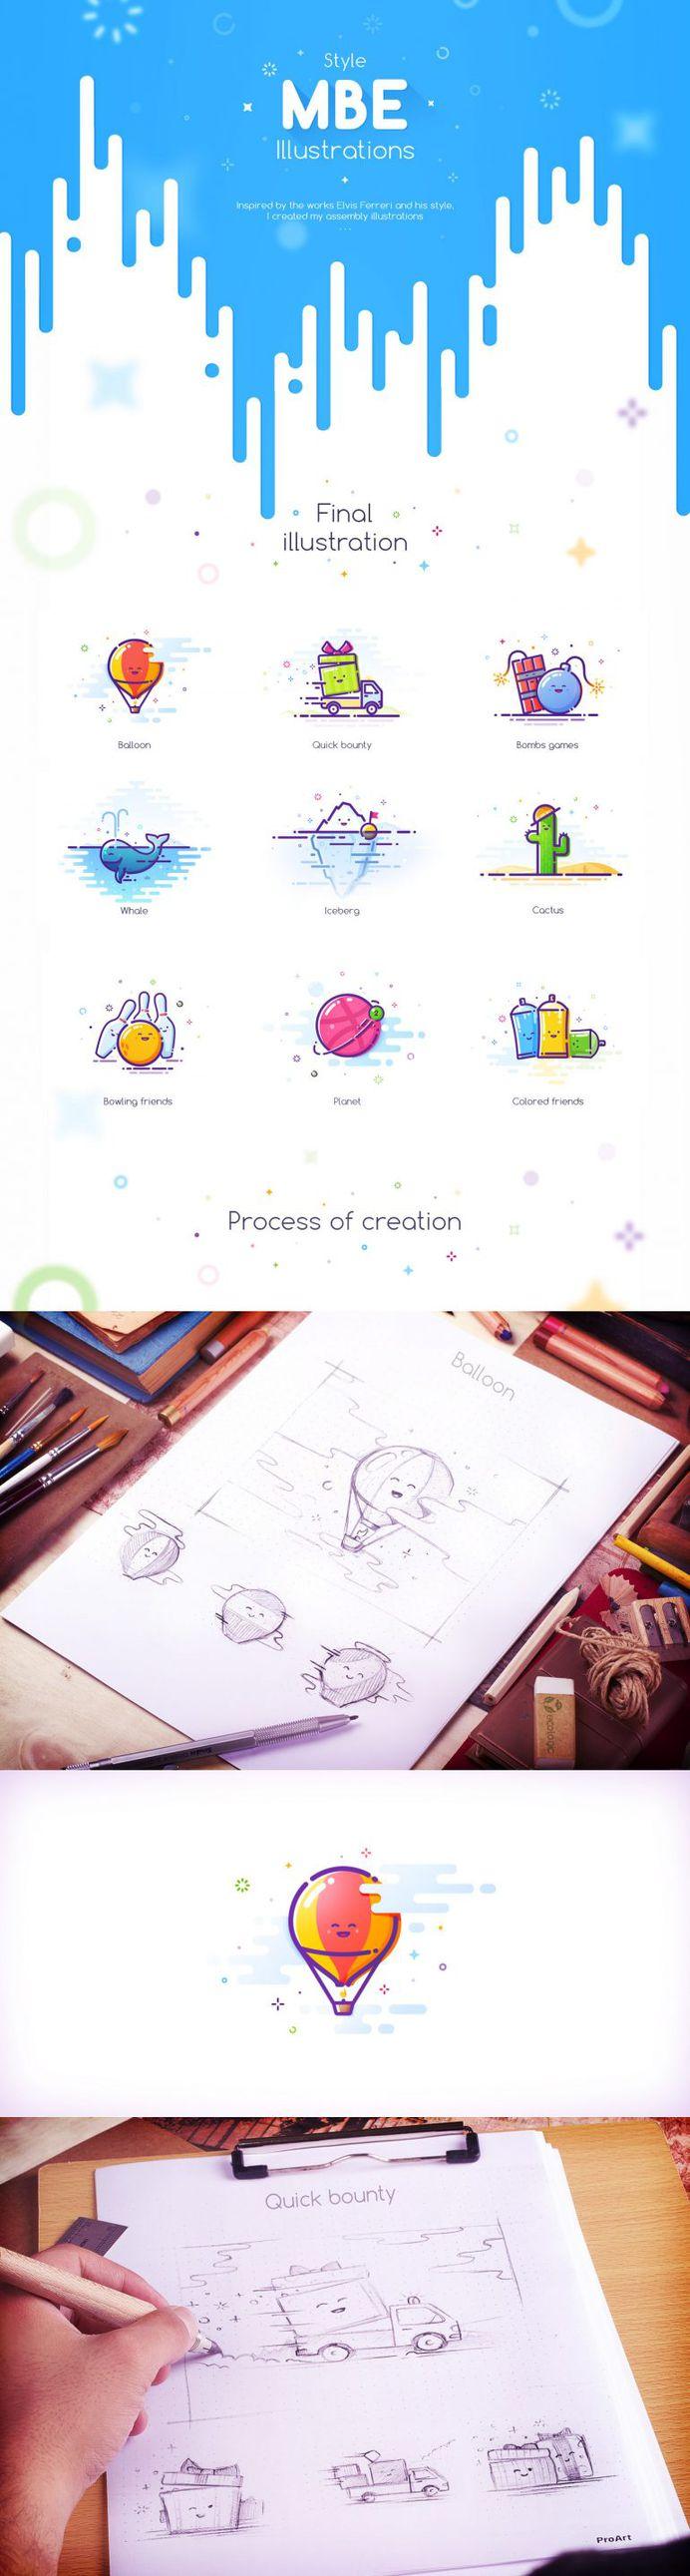 MBE Style Illustration process